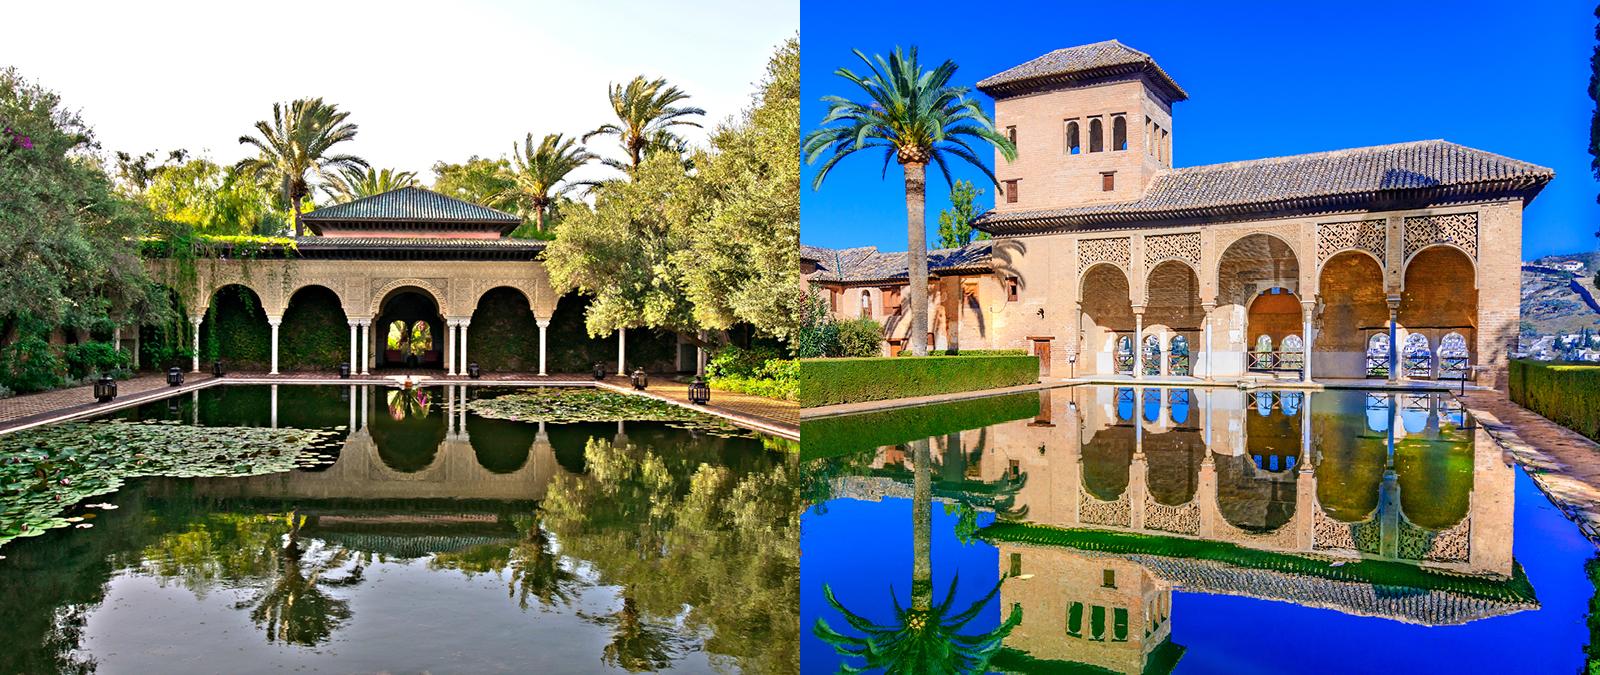 Вилла в Марракеше — копия испанского дворцового коплекса Альгамбра